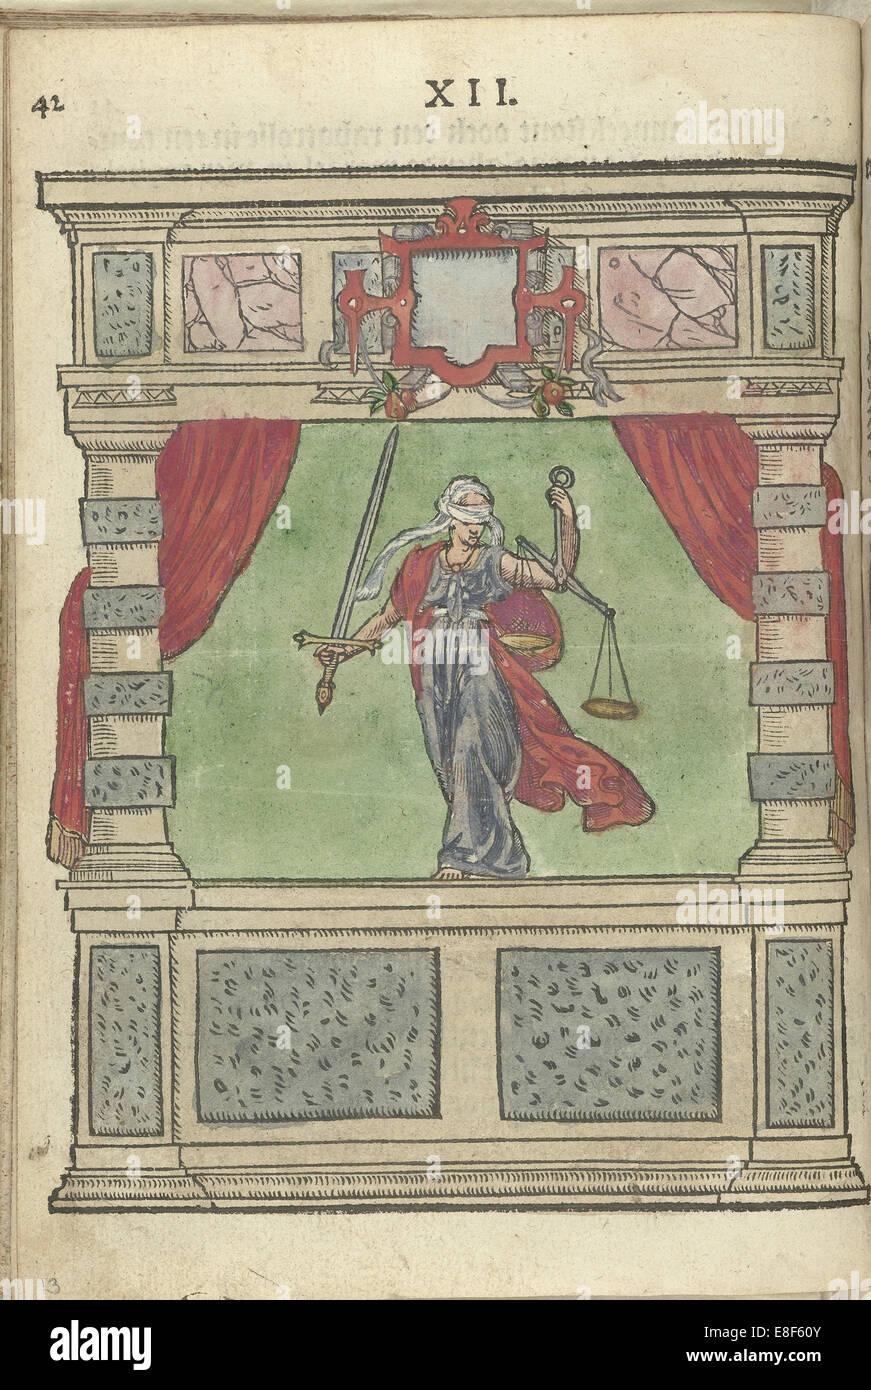 Personification of Justice. Artist: Leest, Antoni van (1543/7-1586/92) - Stock Image